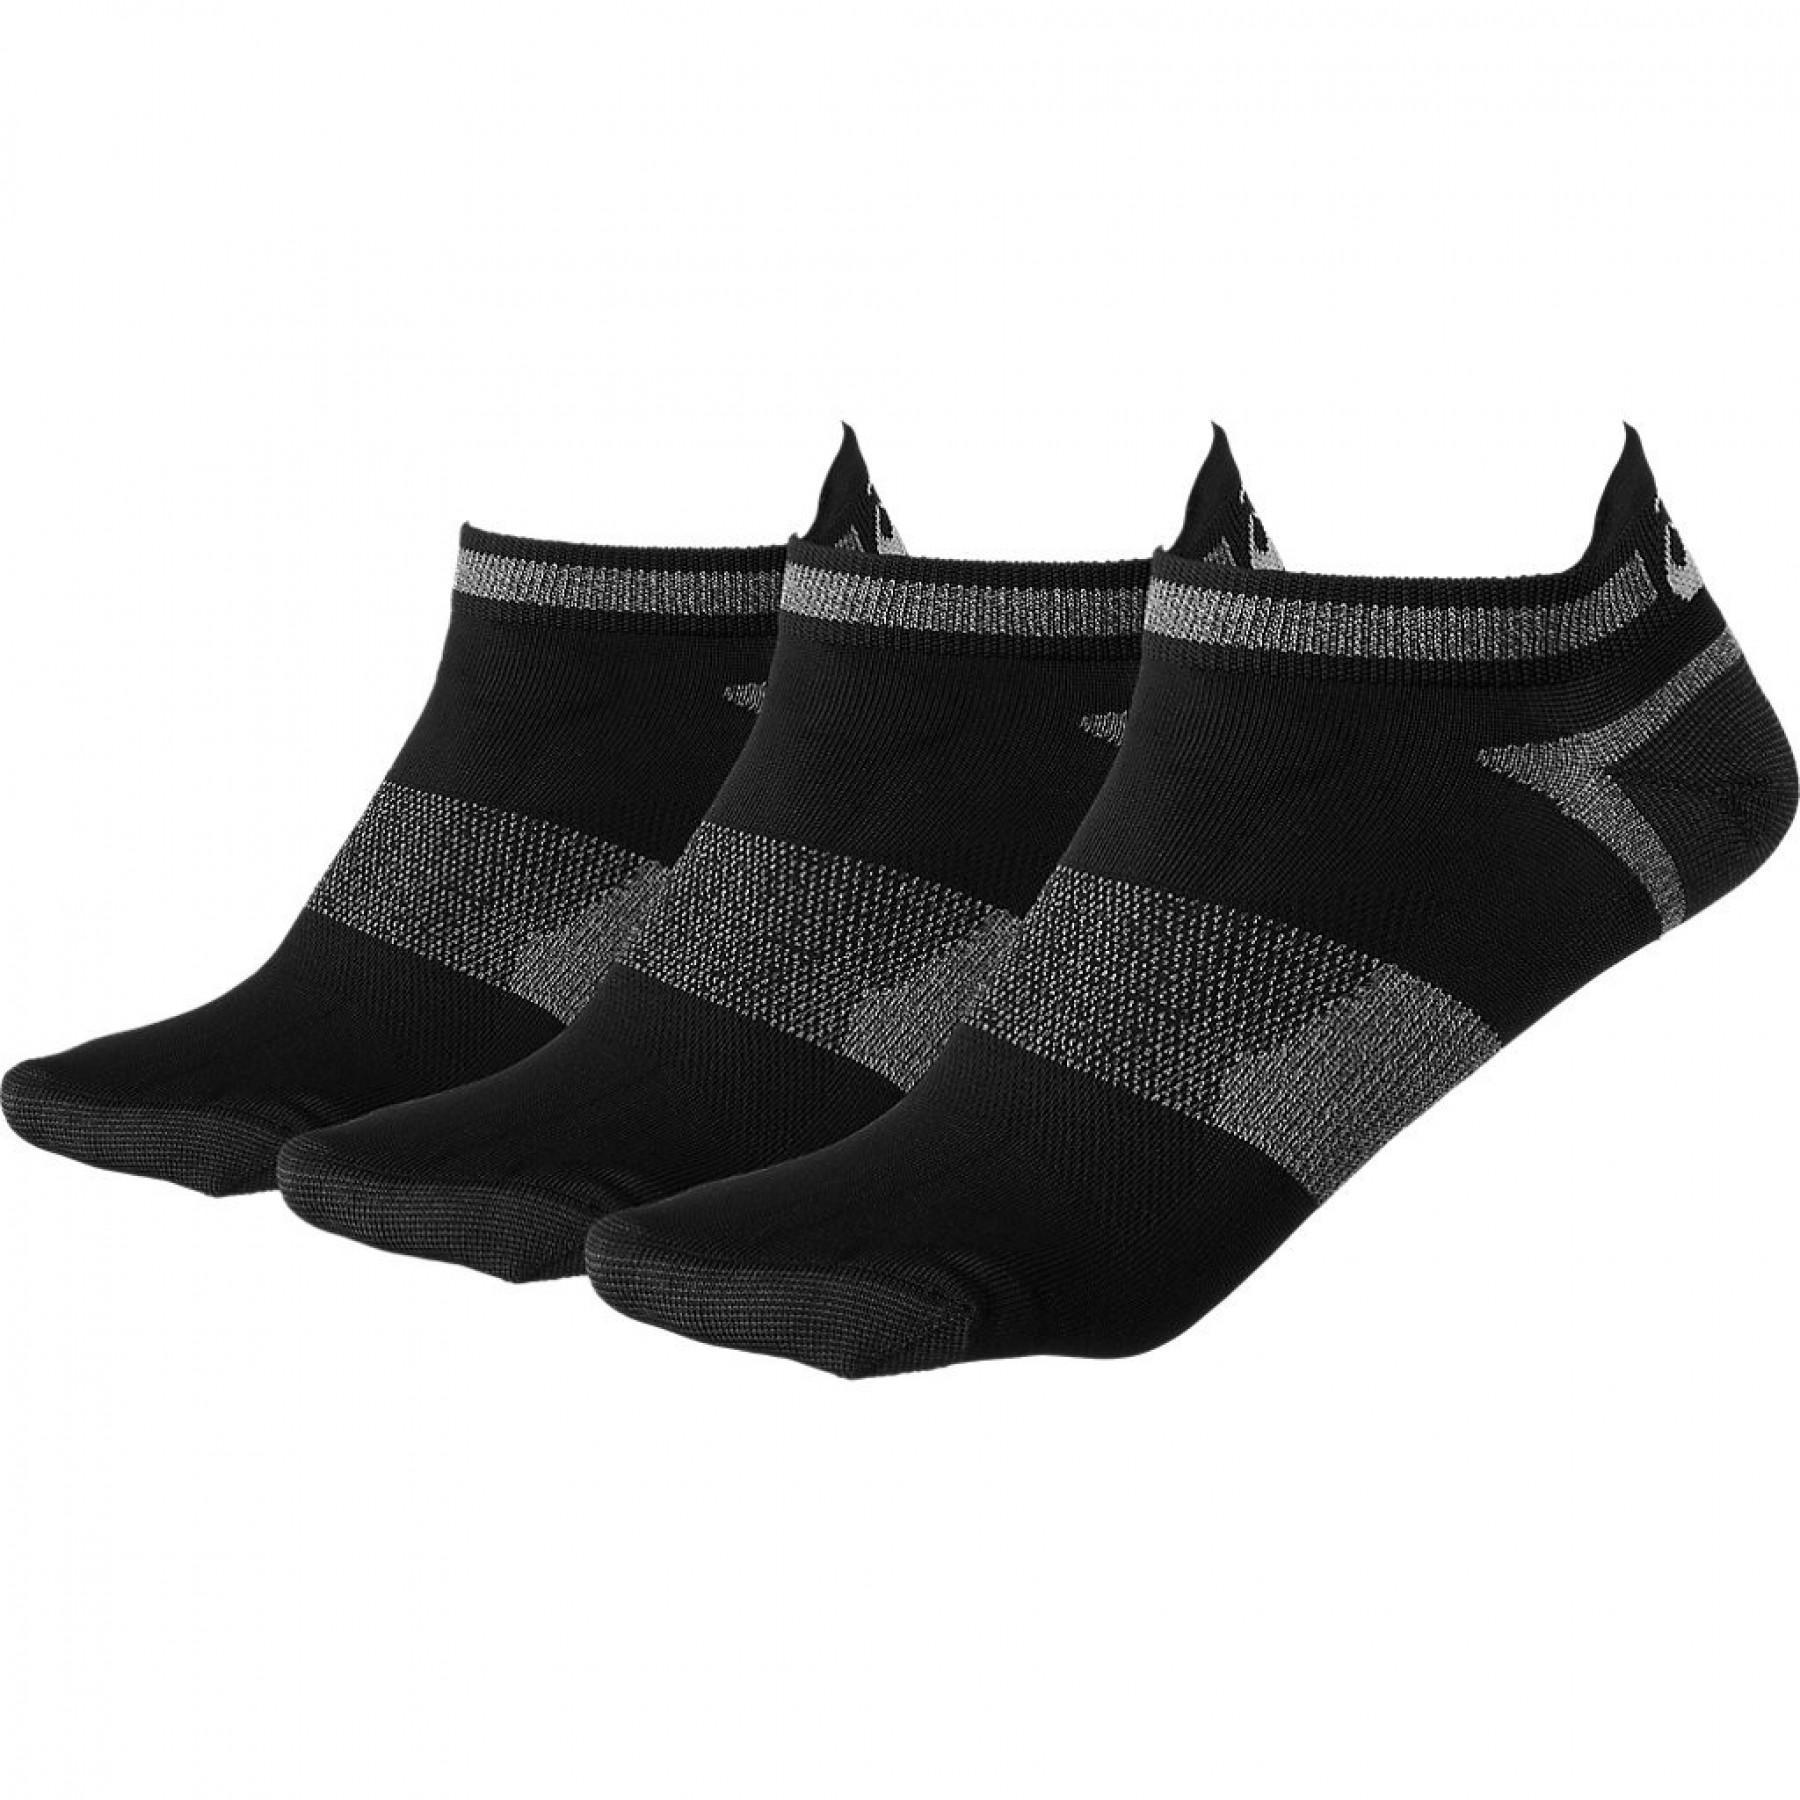 Socks Asics lyte (x3)